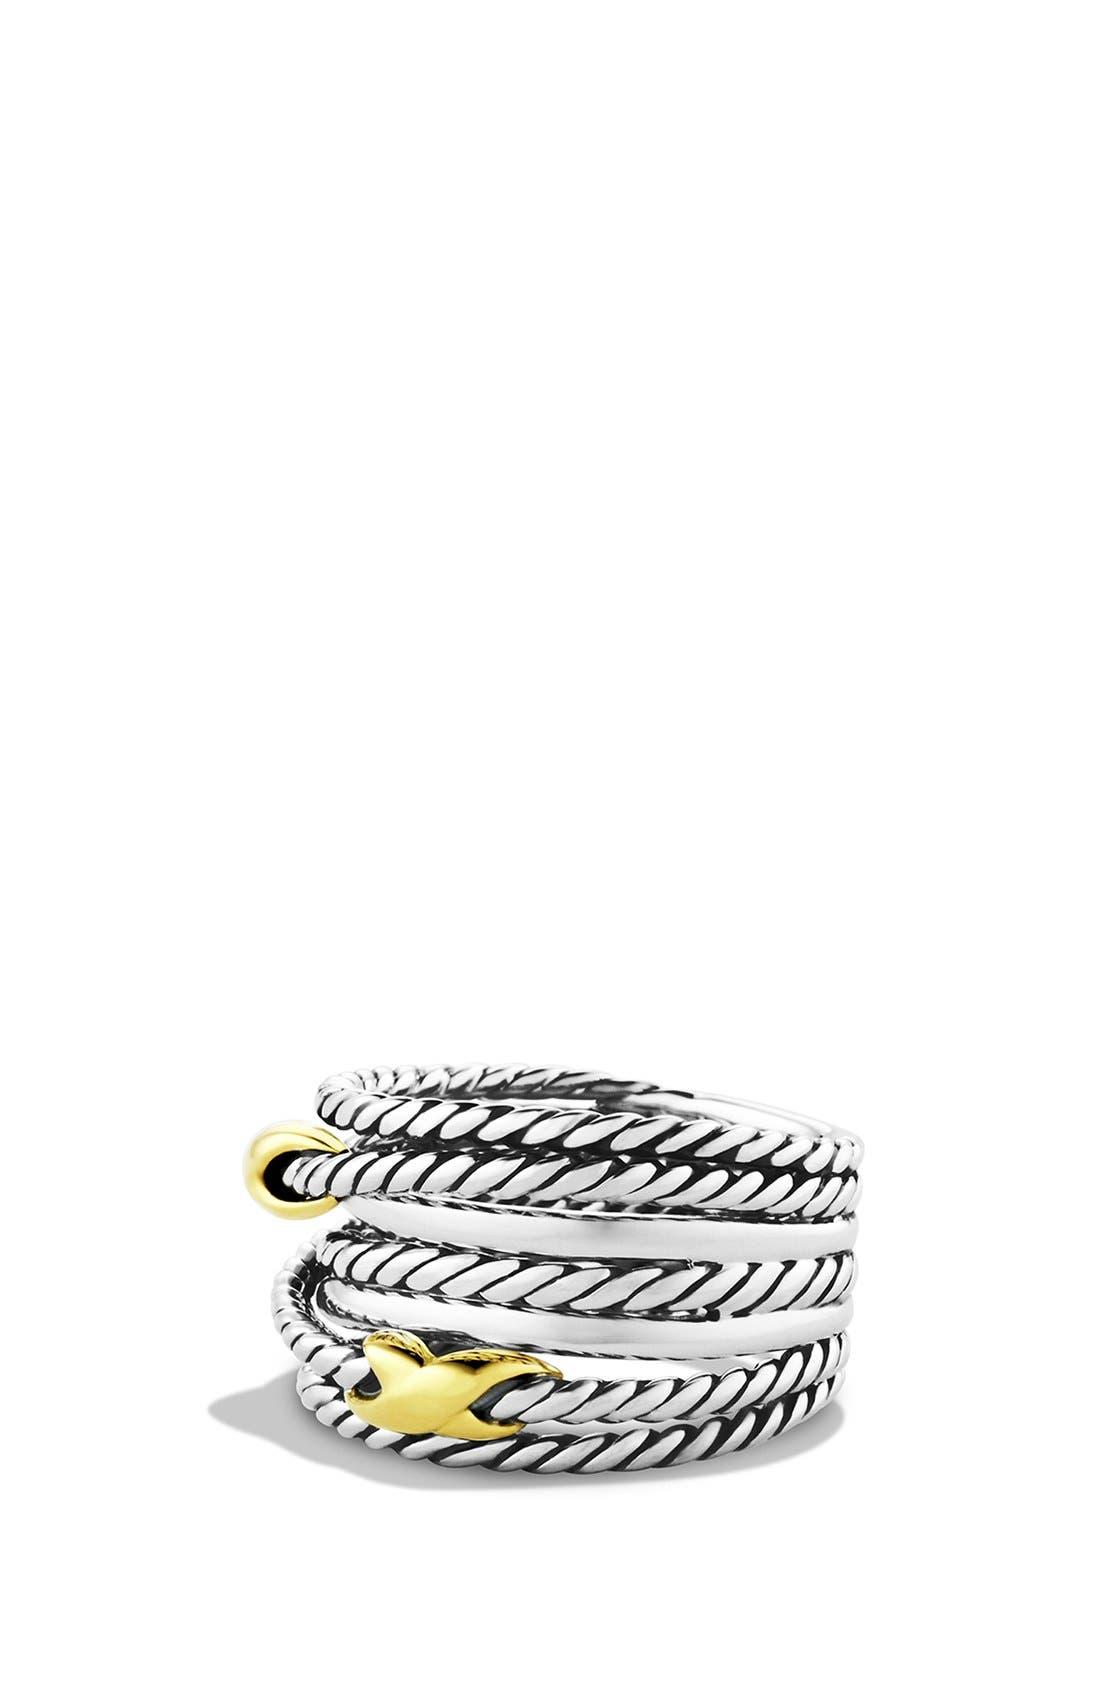 Main Image - David Yurman 'Double X Crossover' Ring